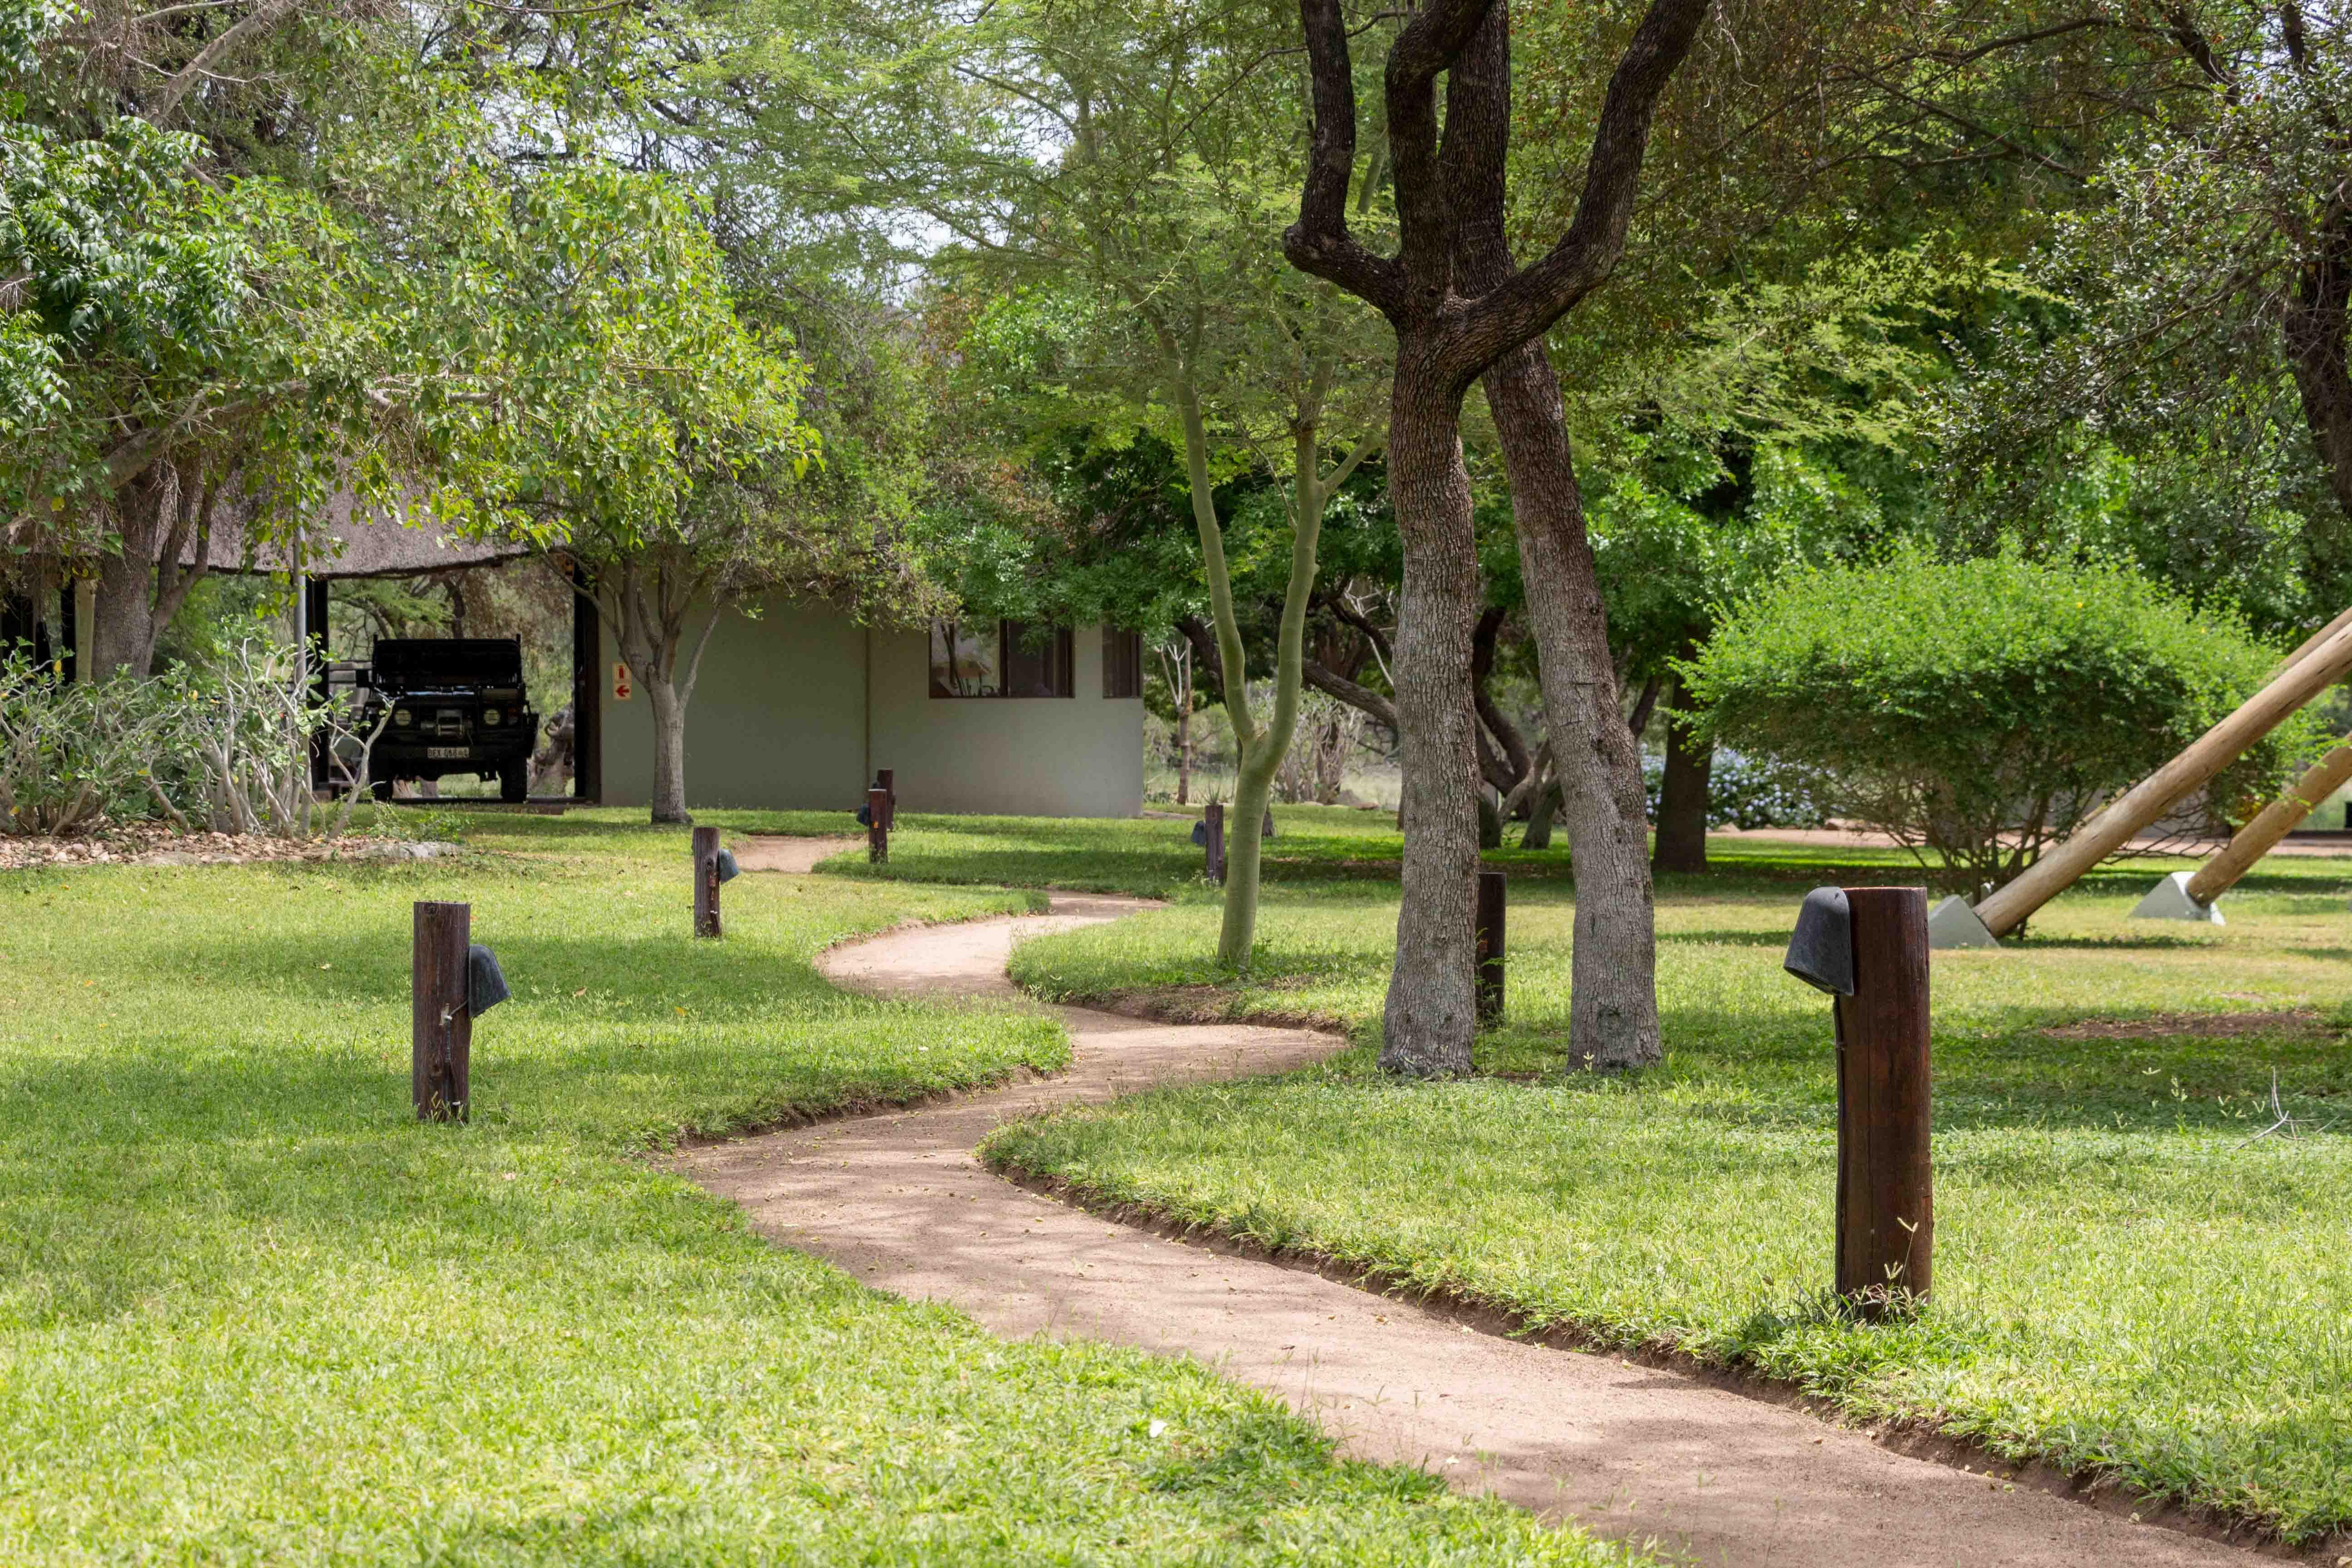 Klaserie West Safari Camp